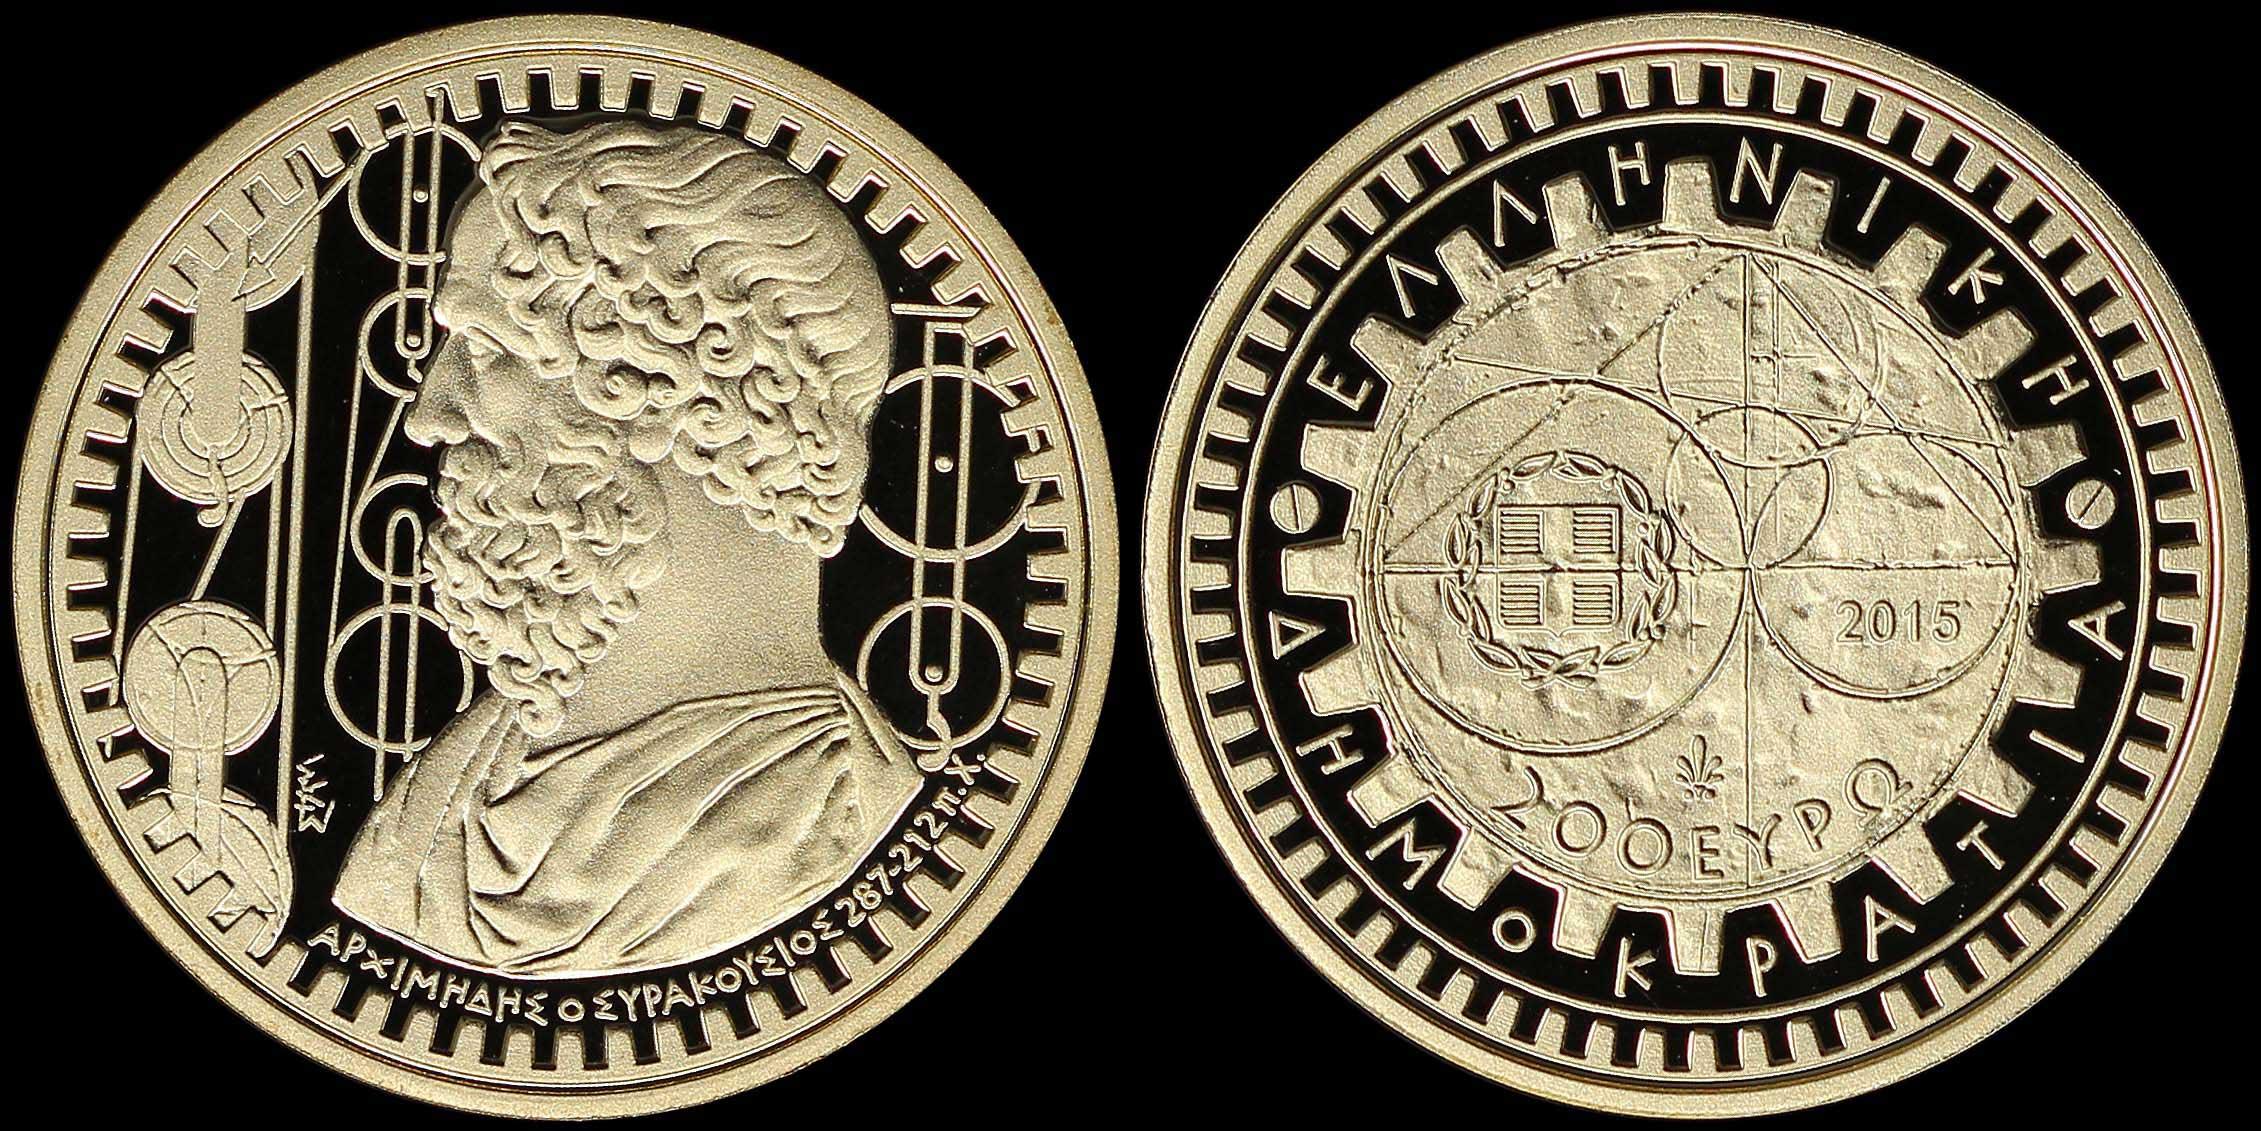 Lot 6271 - -  COINS & TOKENS HELLENIC REPUBLIC & COMMEMORATIVE ISSUES -  A. Karamitsos Public & Live Internet Auction 682 (Part A) Coins, Medals & Banknotes